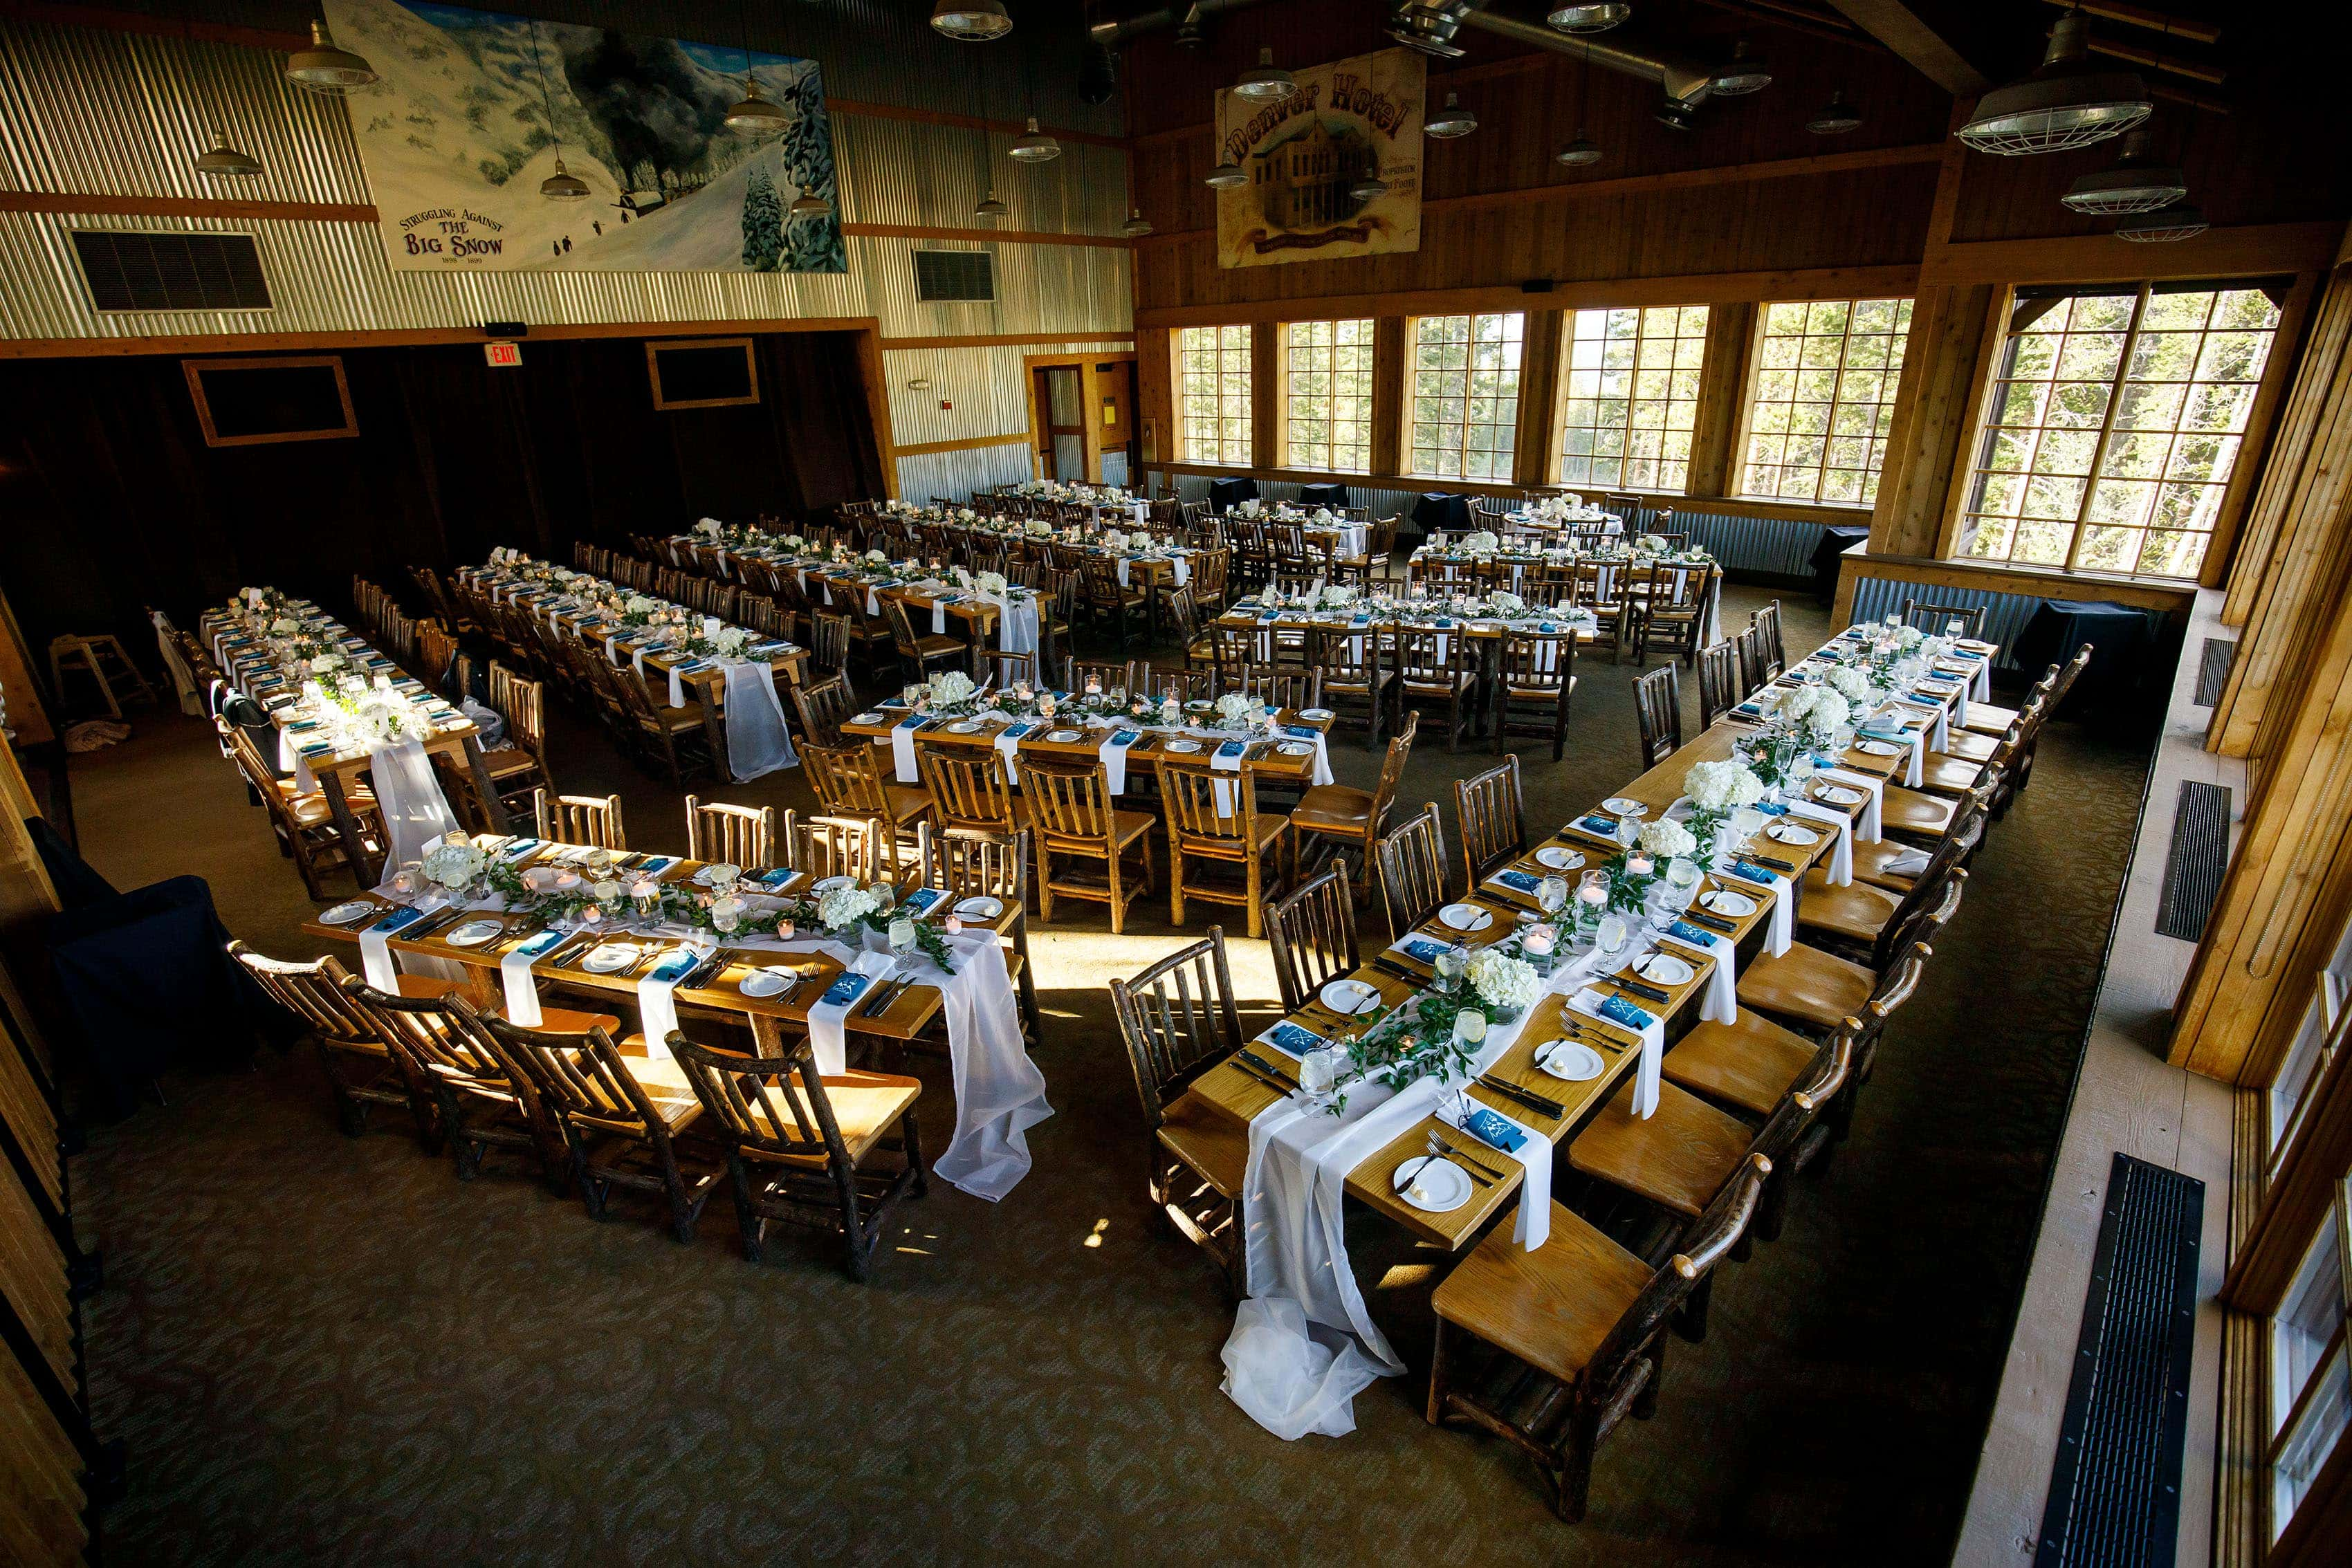 Wedding reception table setup for dinner